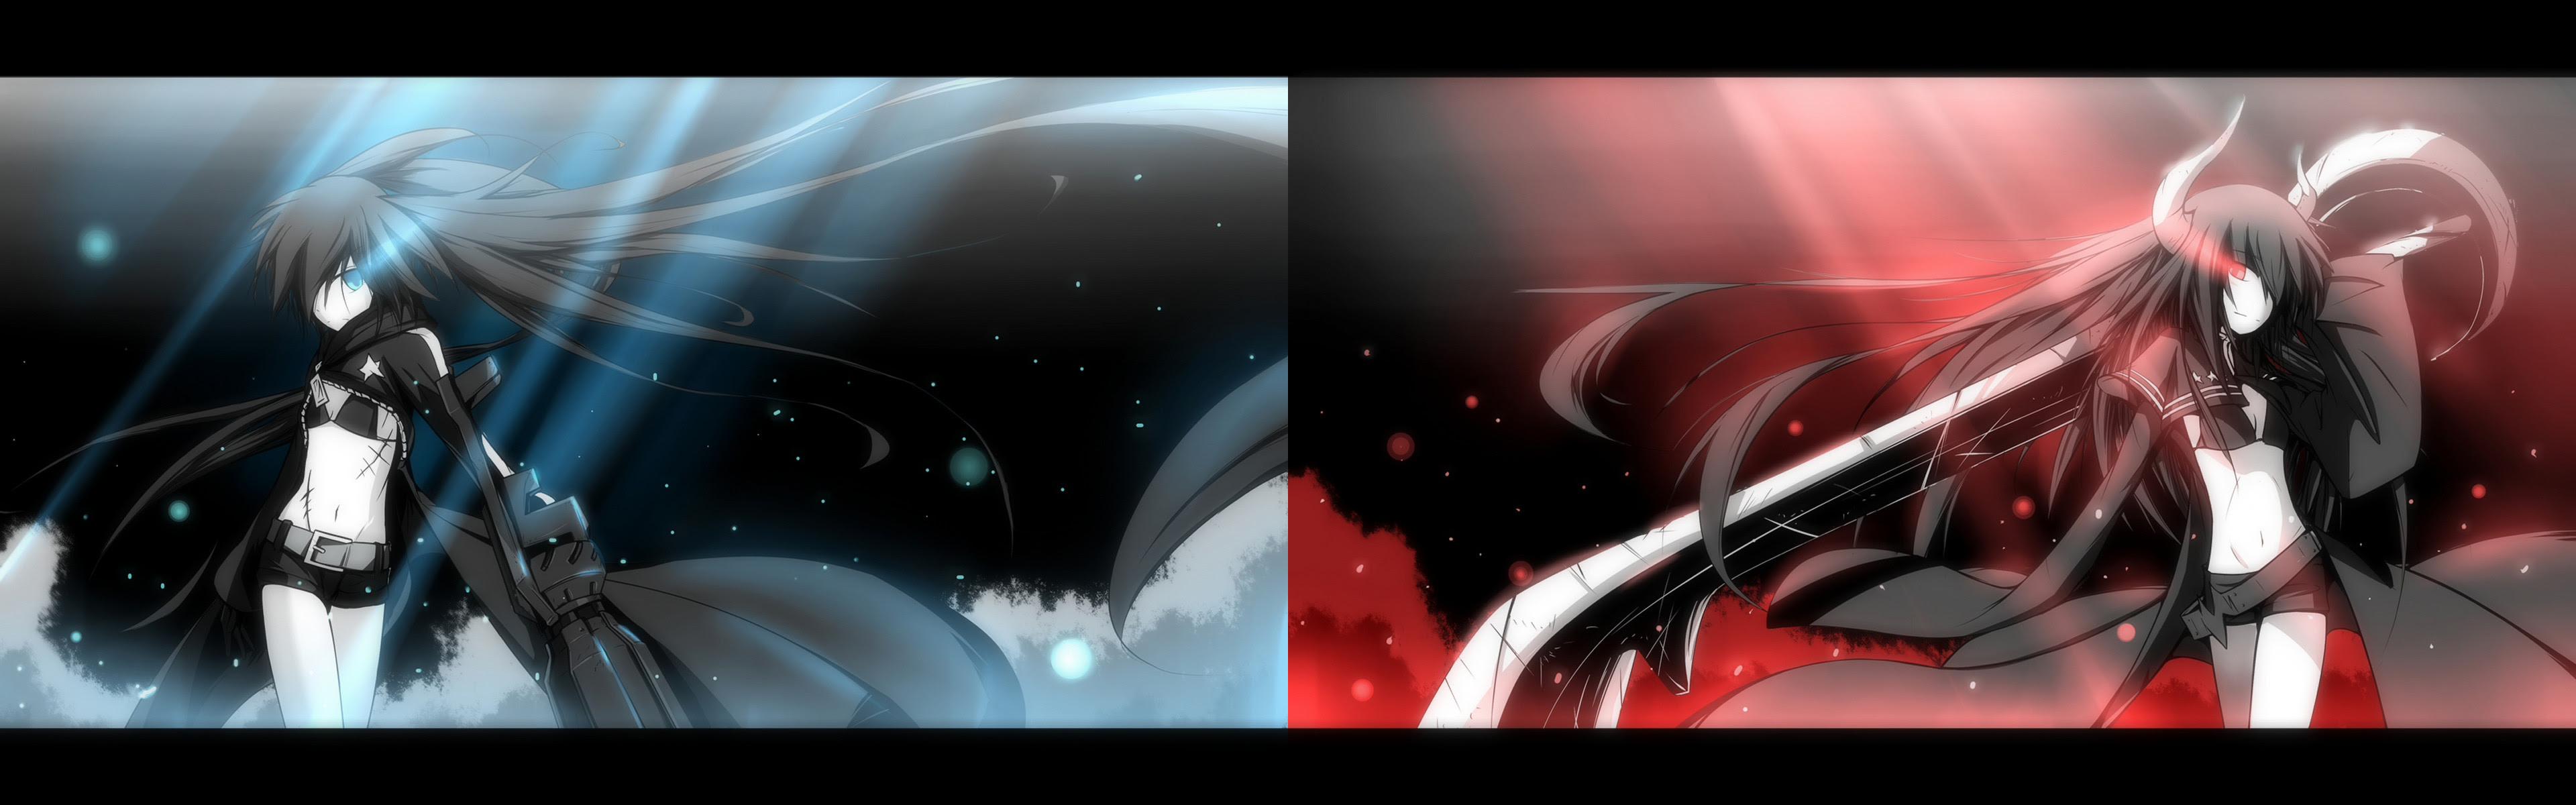 27 Dark Anime Dual Screen Wallpaper Sachi Wallpaper